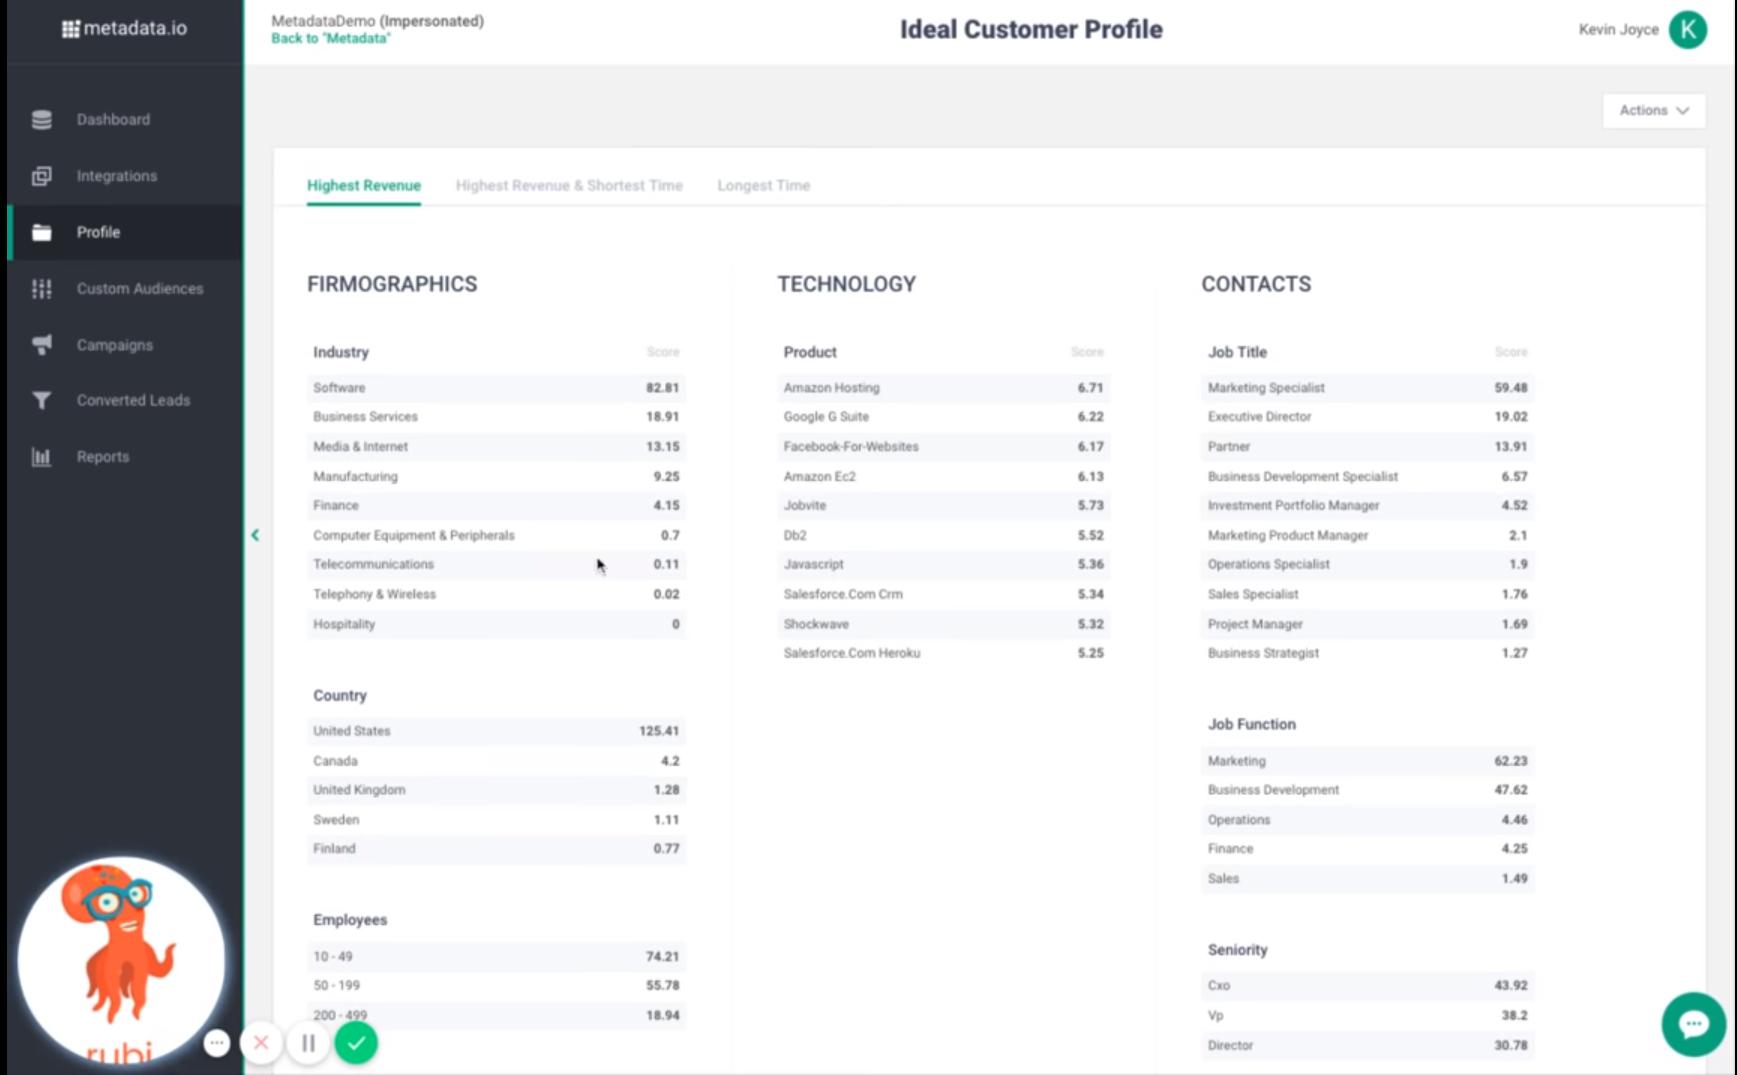 Metadata customer profile